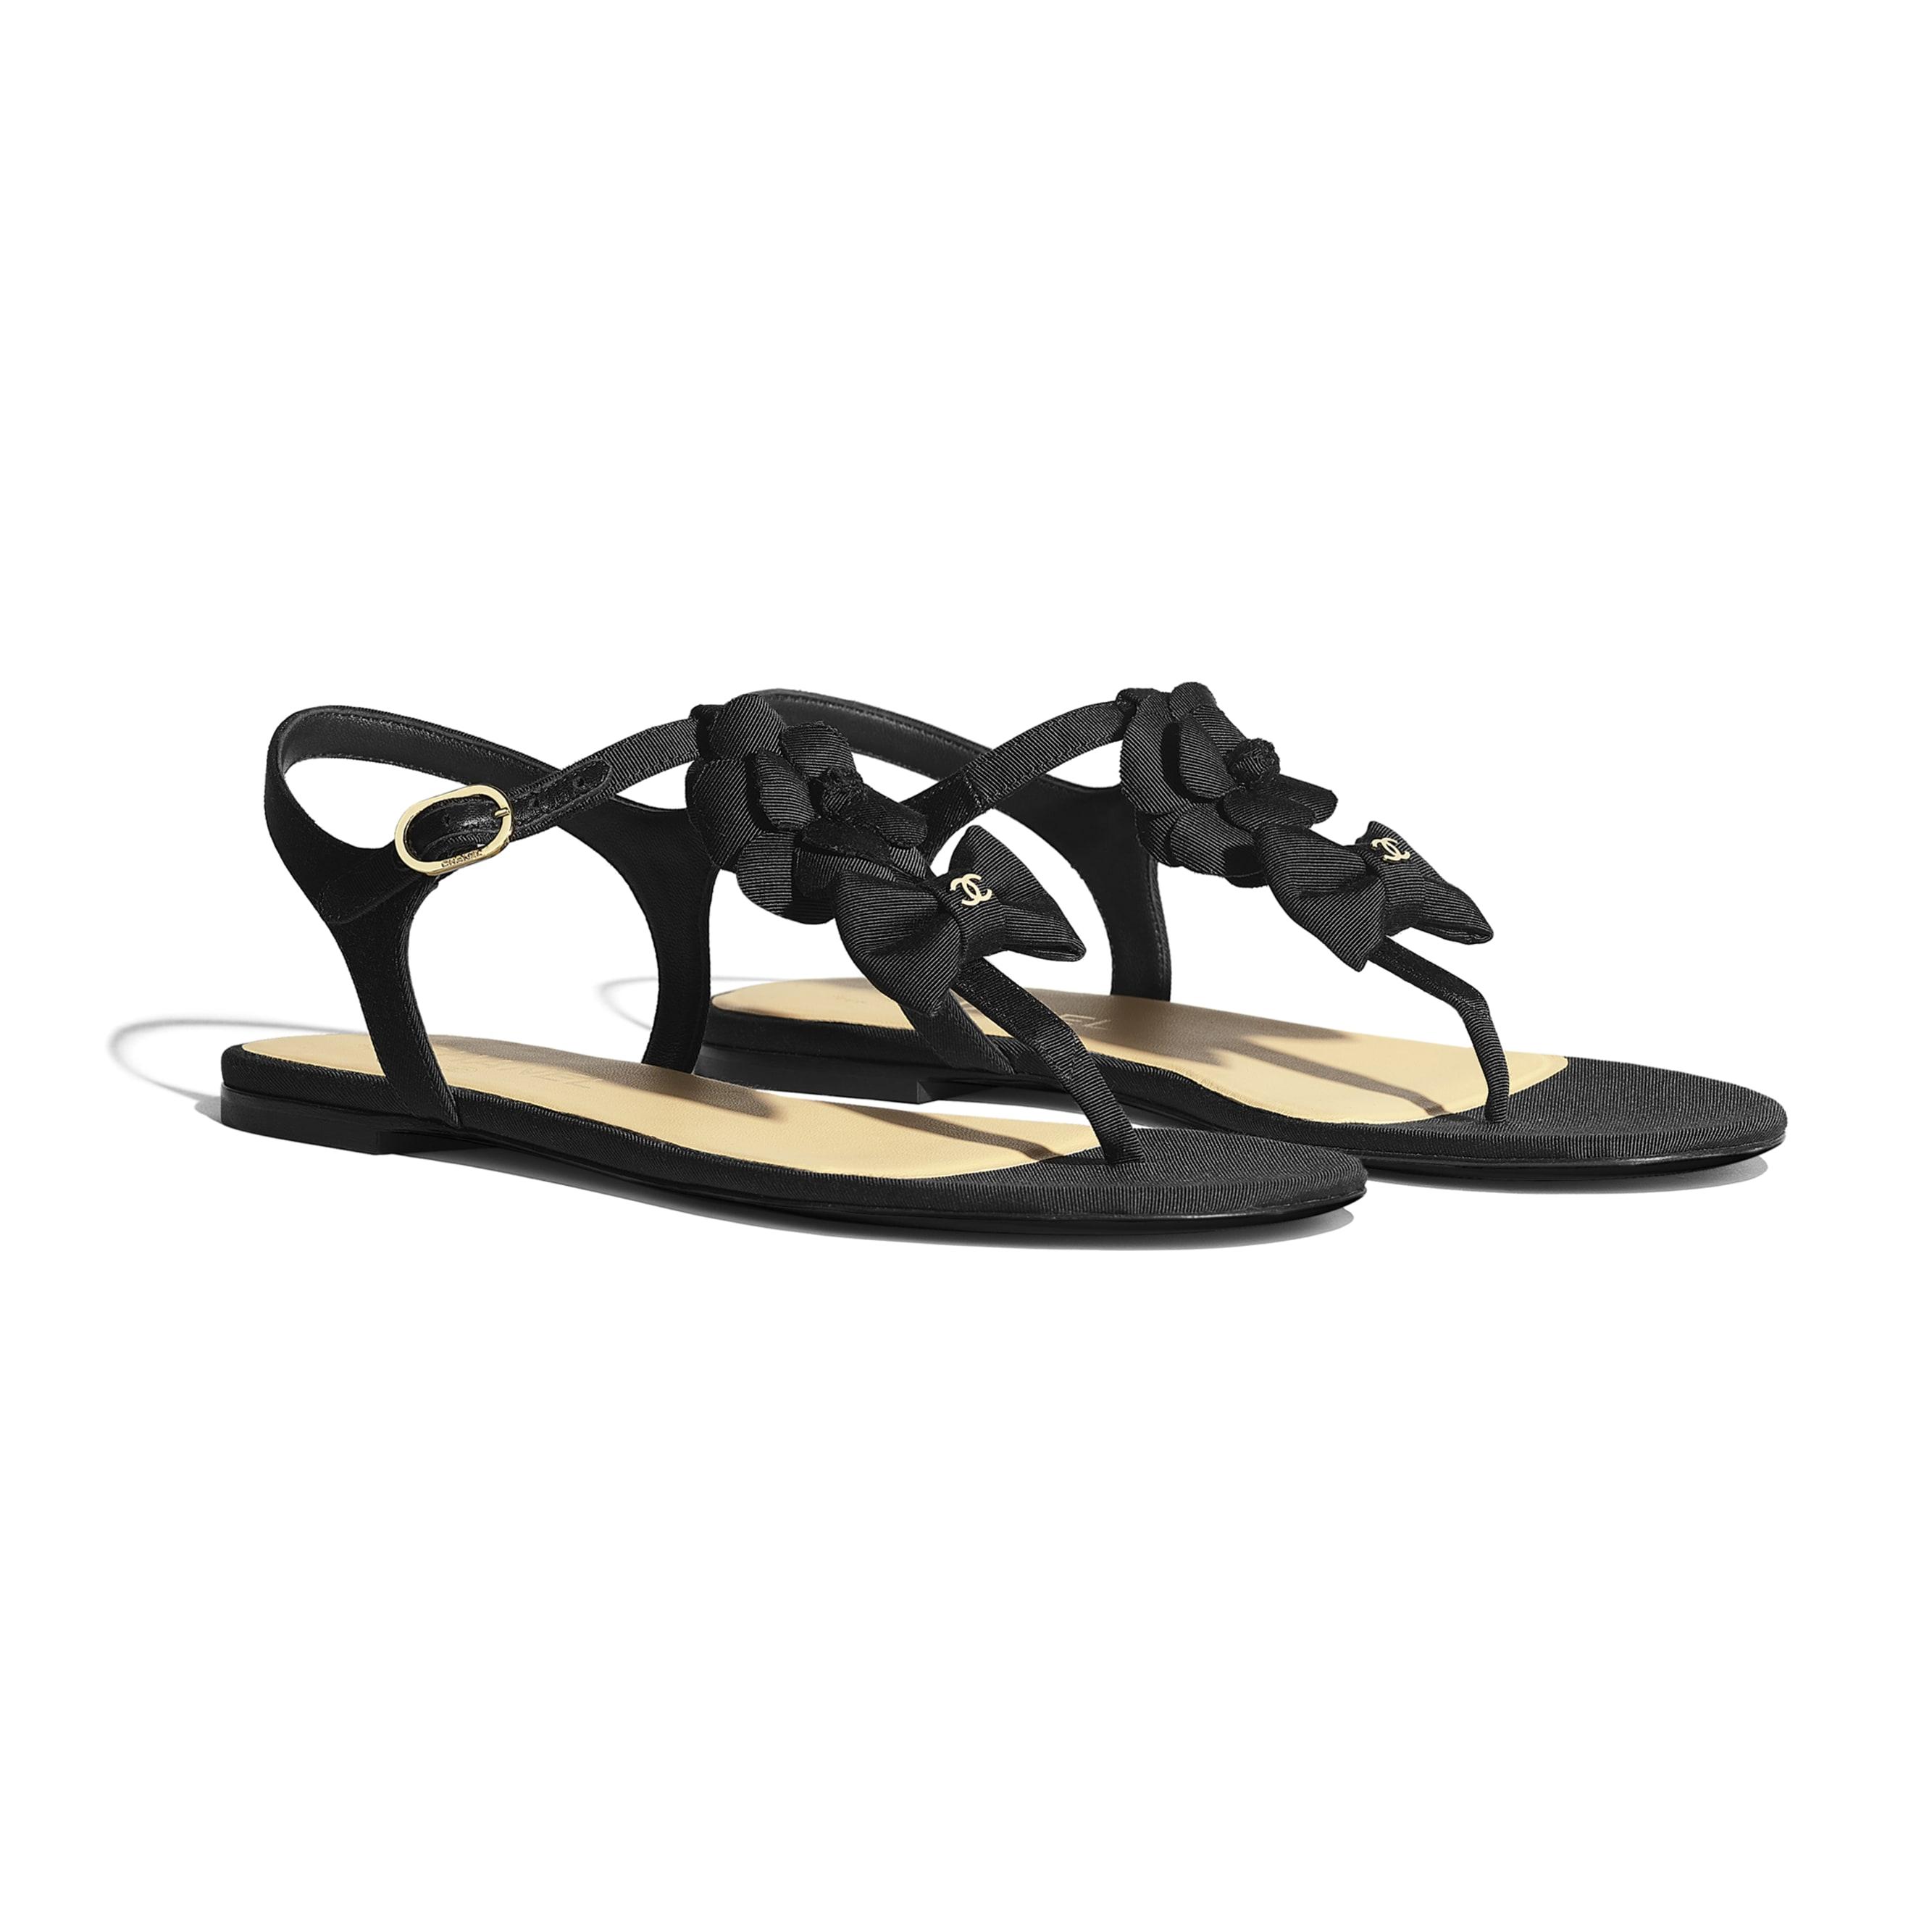 Sandals - Black - Grosgrain - CHANEL - Alternative view - see standard sized version